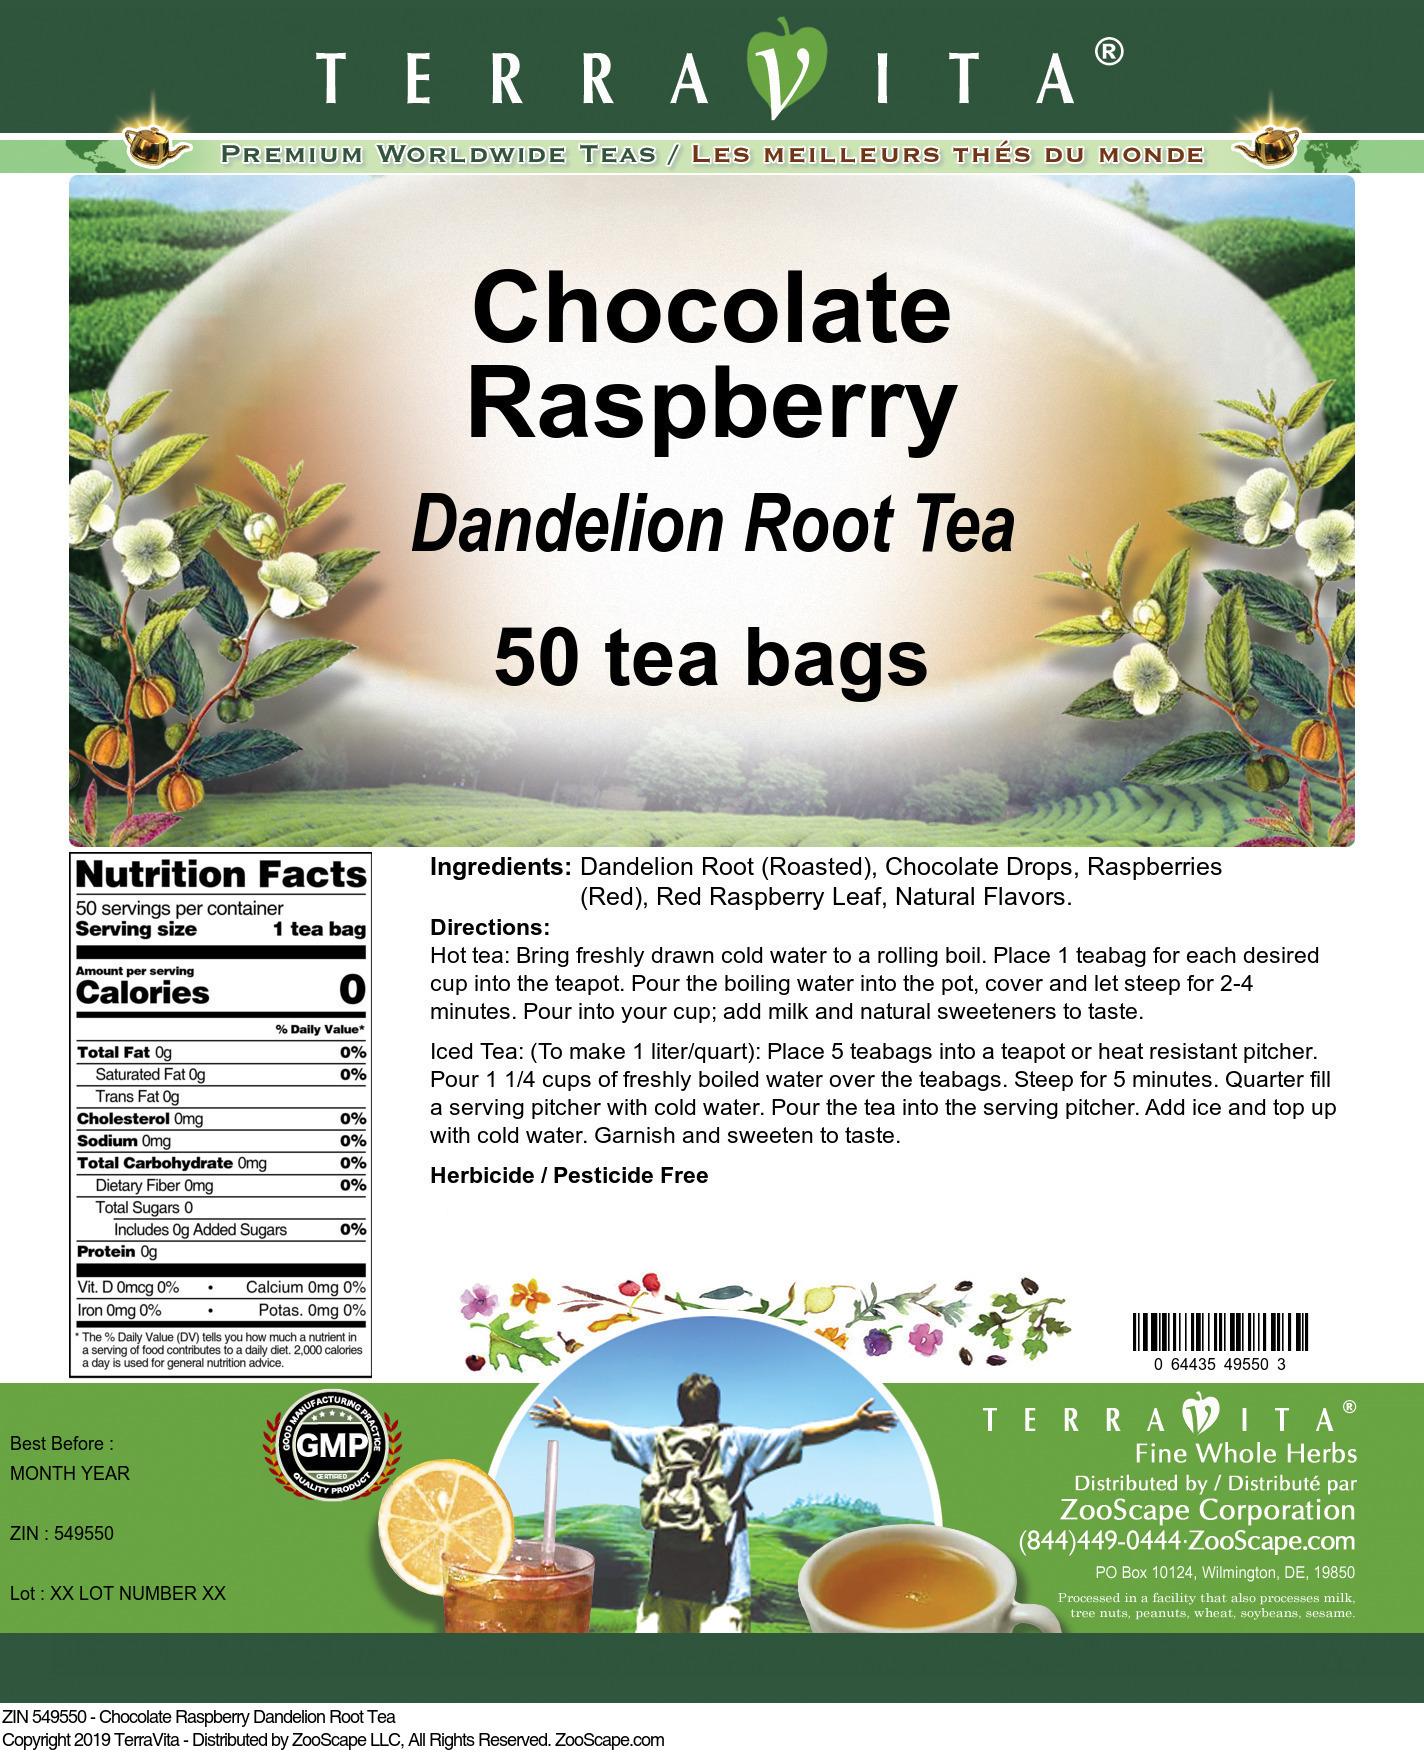 Chocolate Raspberry Dandelion Root Tea